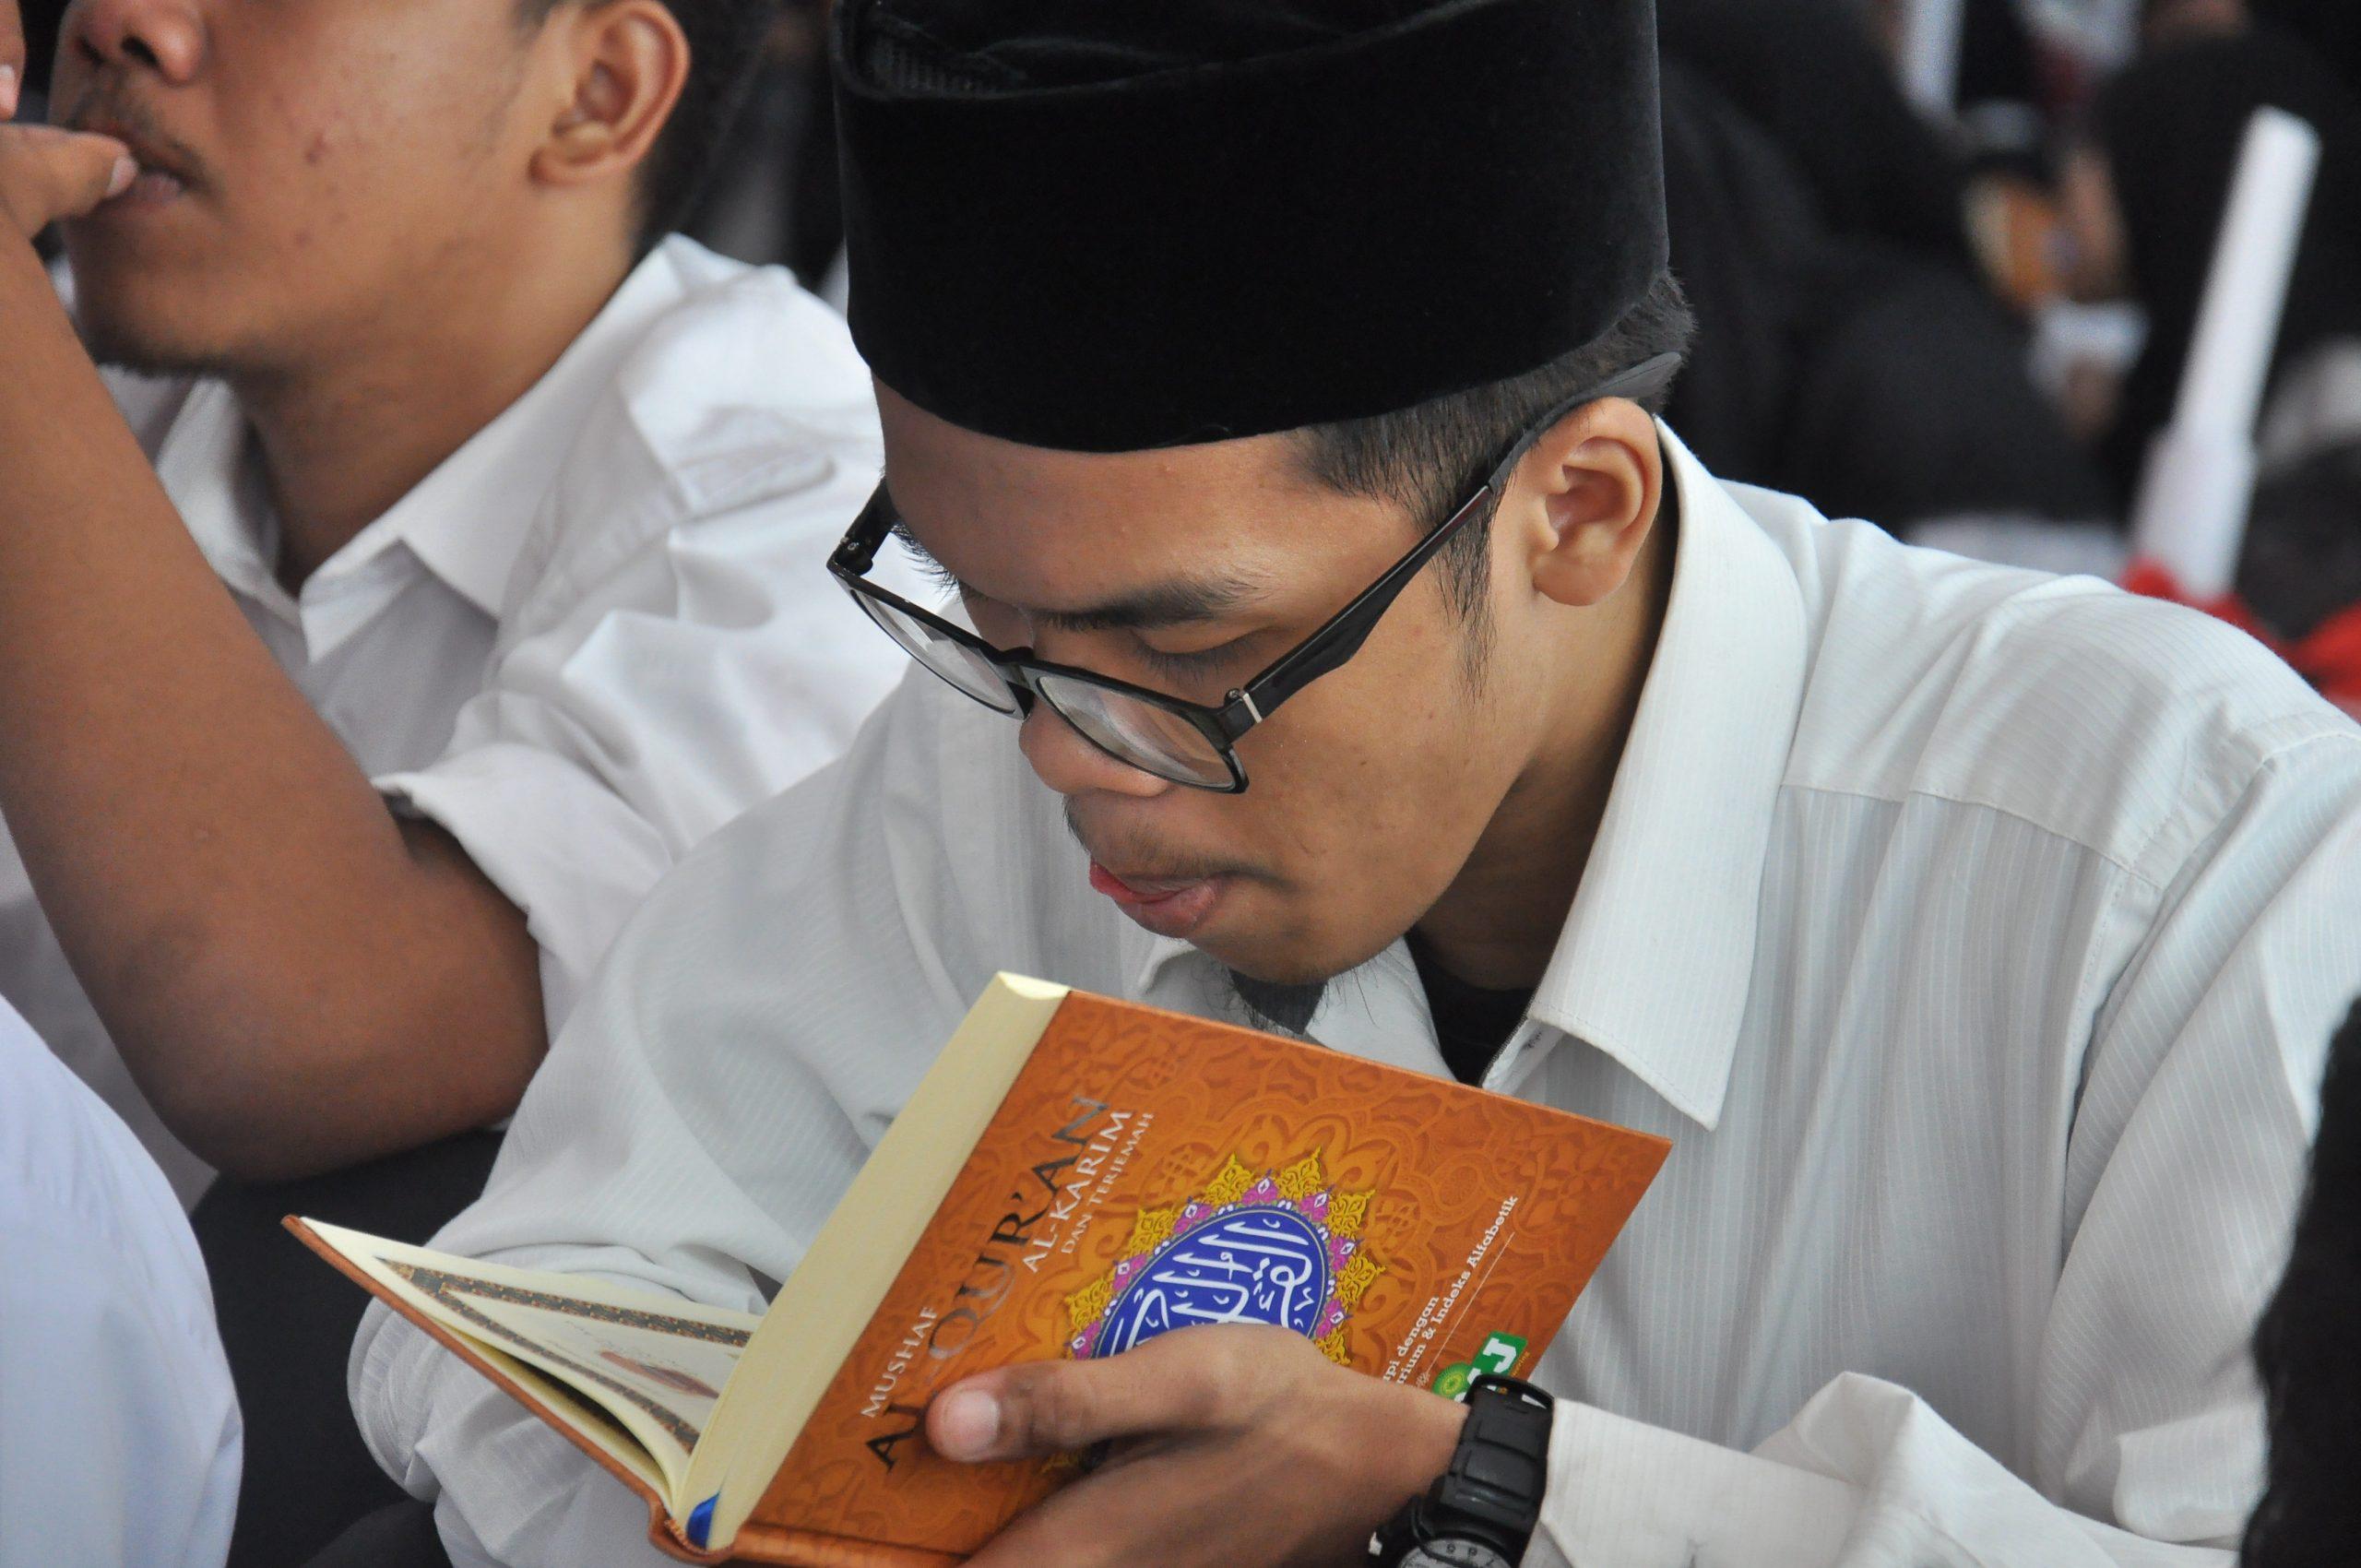 Menjadi Lulusan Muhammadiyah Harus Hafal Juz Amma.